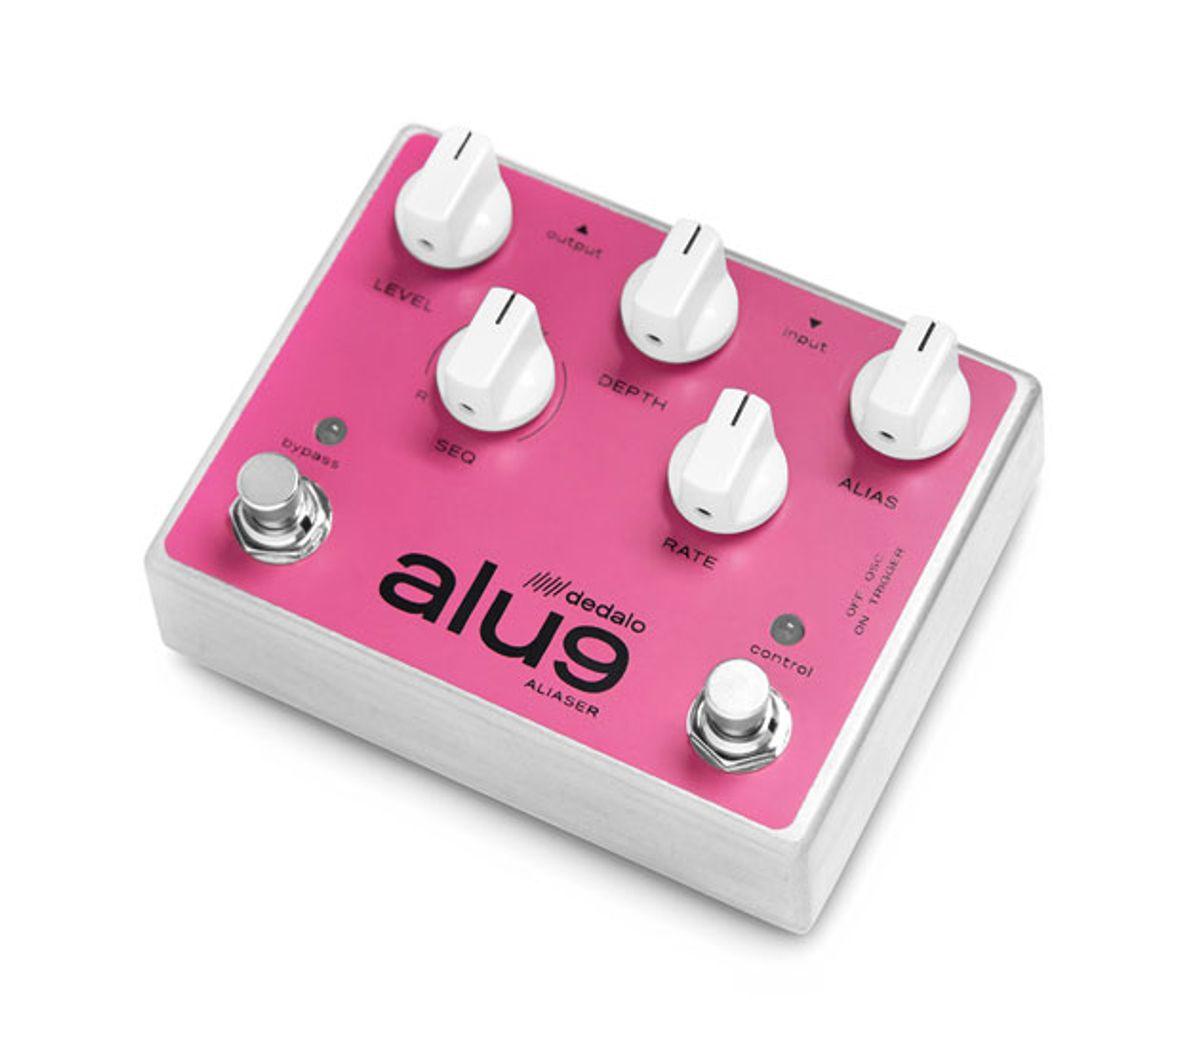 Dedalo Fx Presents the ALU9 Aliaser